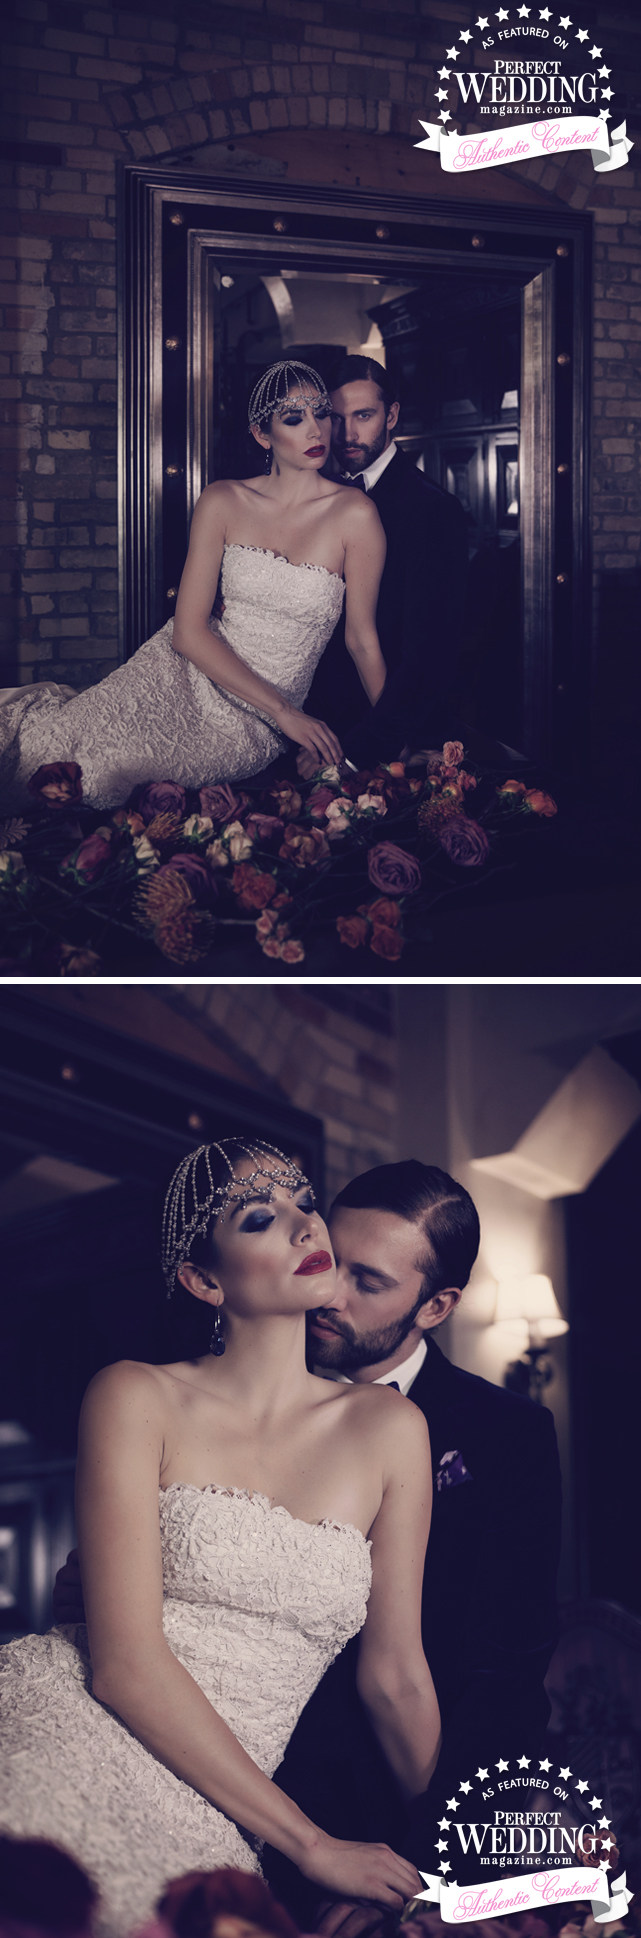 Oscar de la Renta, Oscar de la Renta Wedding theme, Wedding Décor, Floral trends, A TRIBUTE TO STYLE, Hacienda Weddings, Bridal Fashion, Groom Attire, Perfect Wedding Magazine